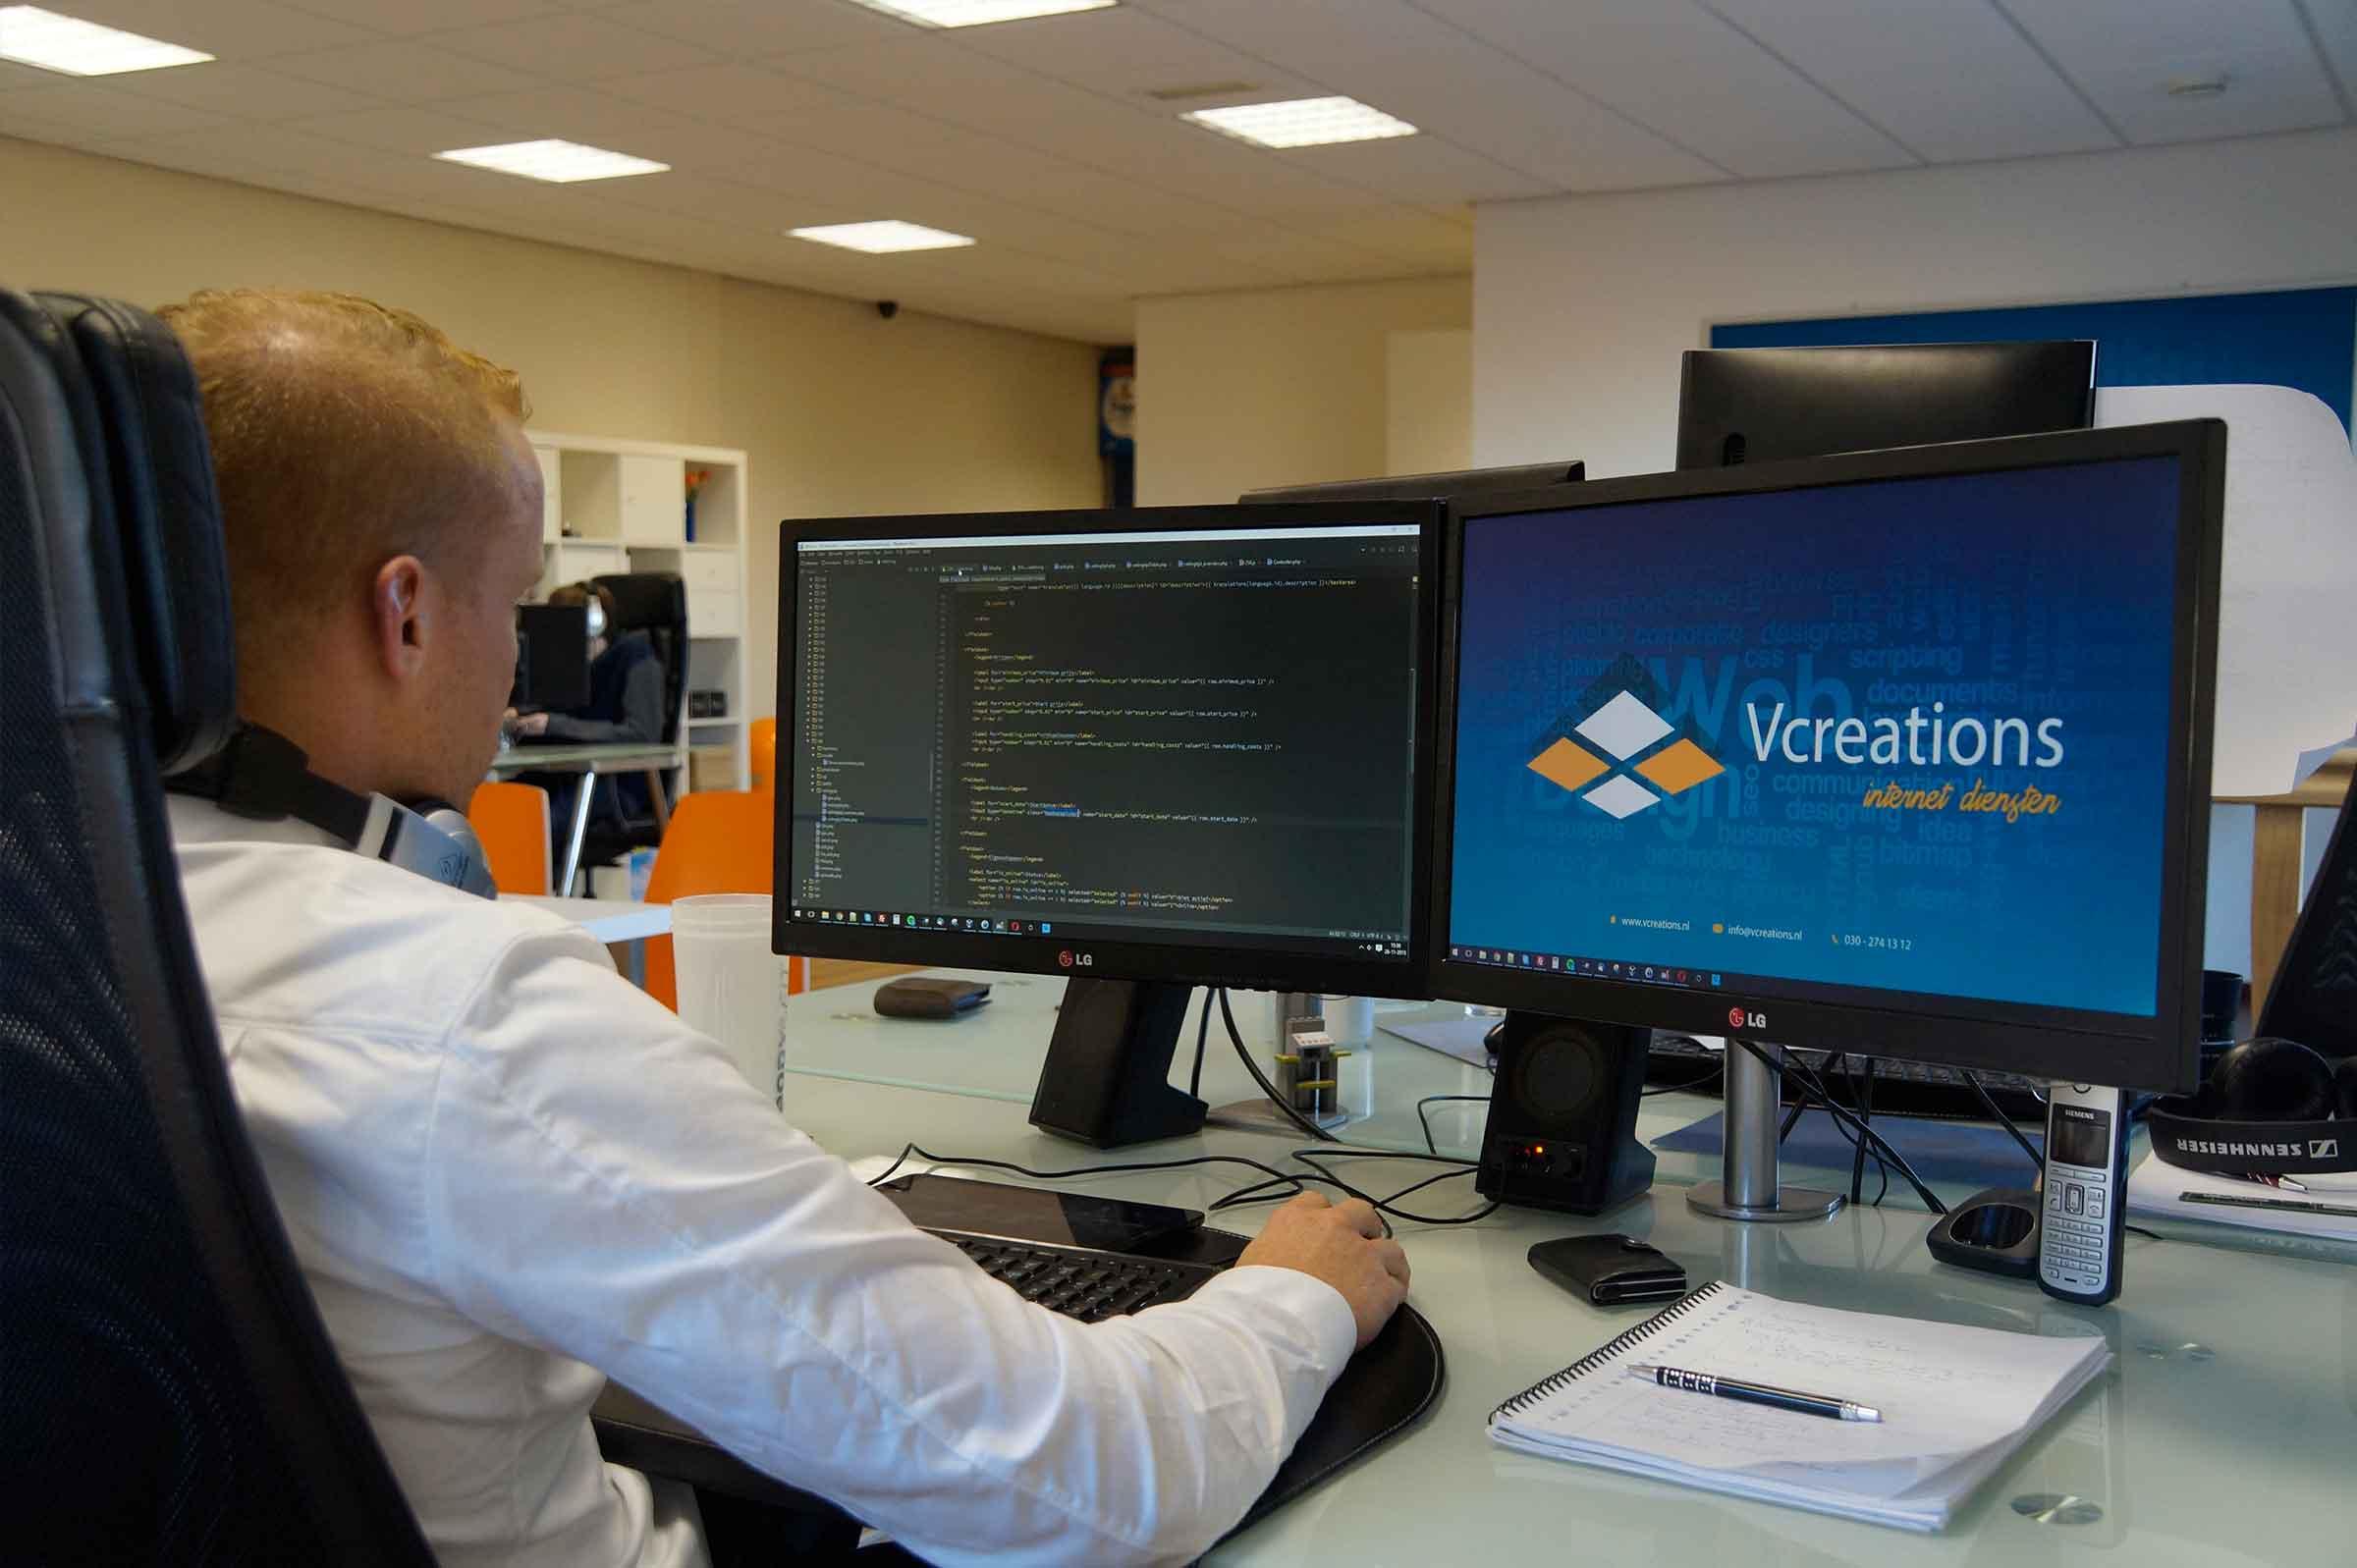 website laten maken Utrecht